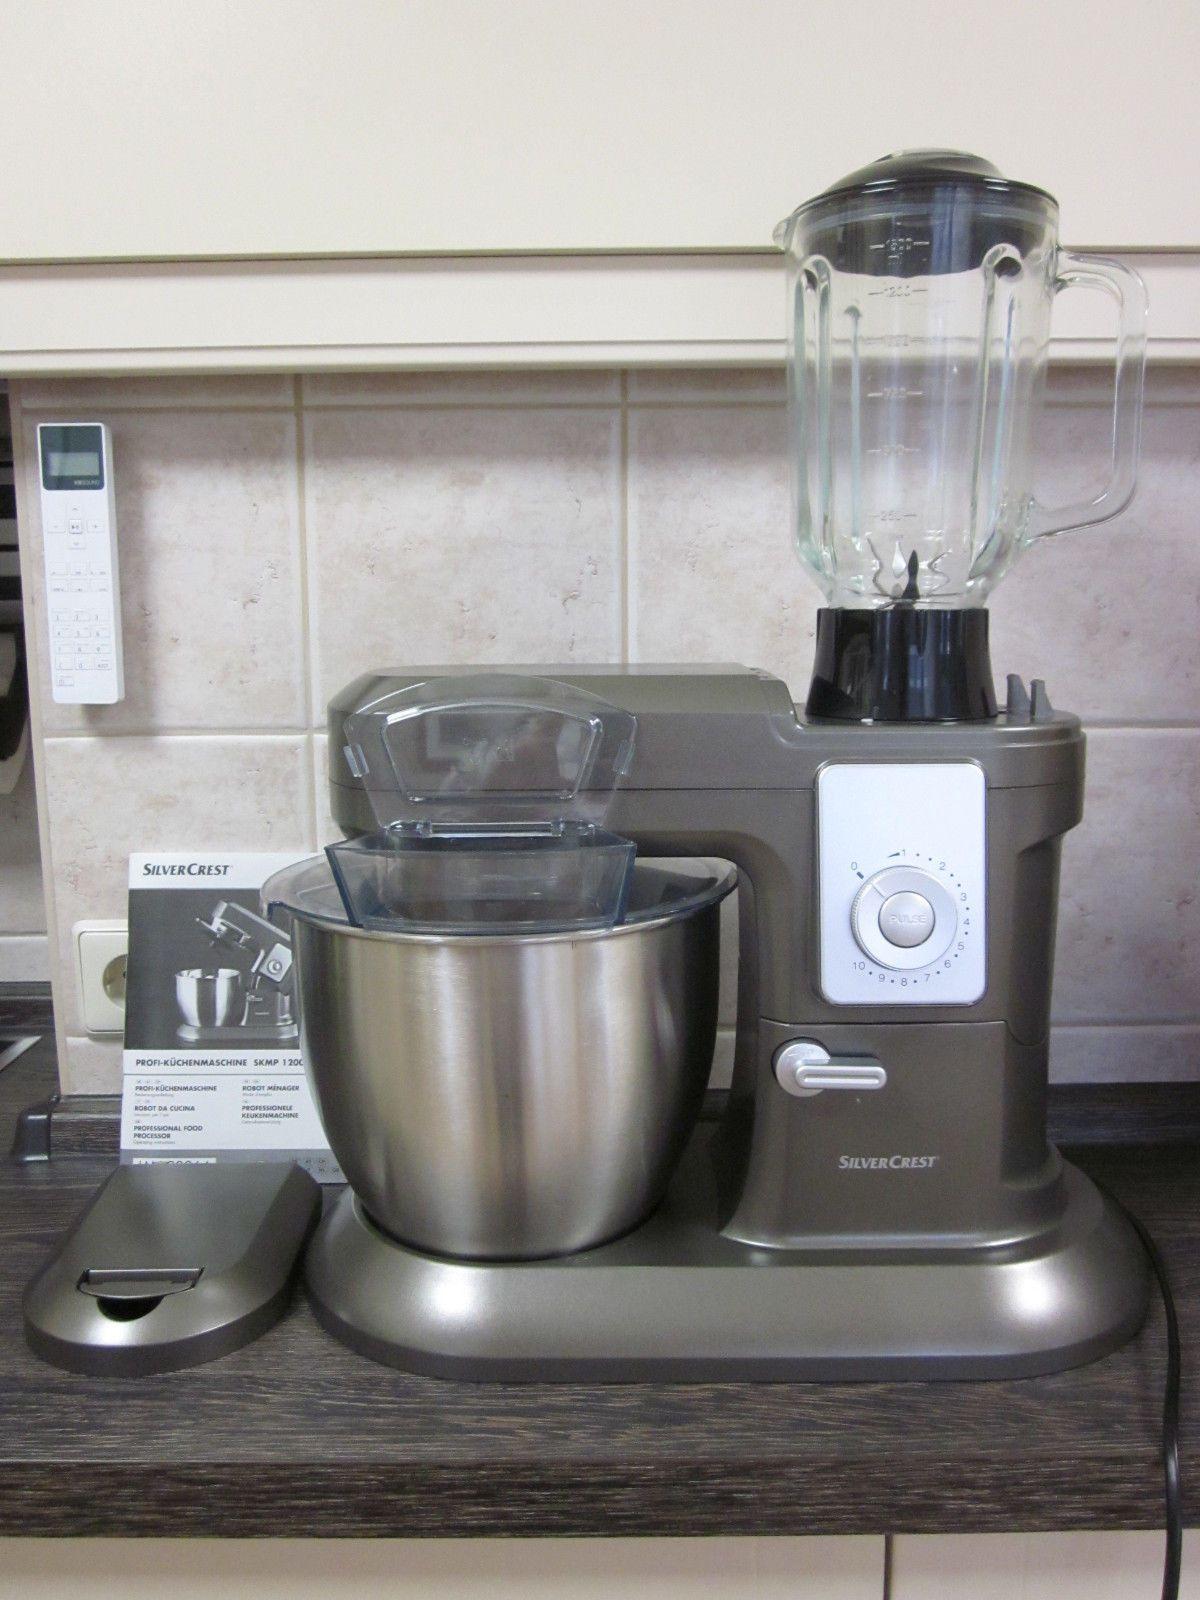 Kuchenmaschine Profi Kuchenmaschine Silvercrest Mixer Mixen